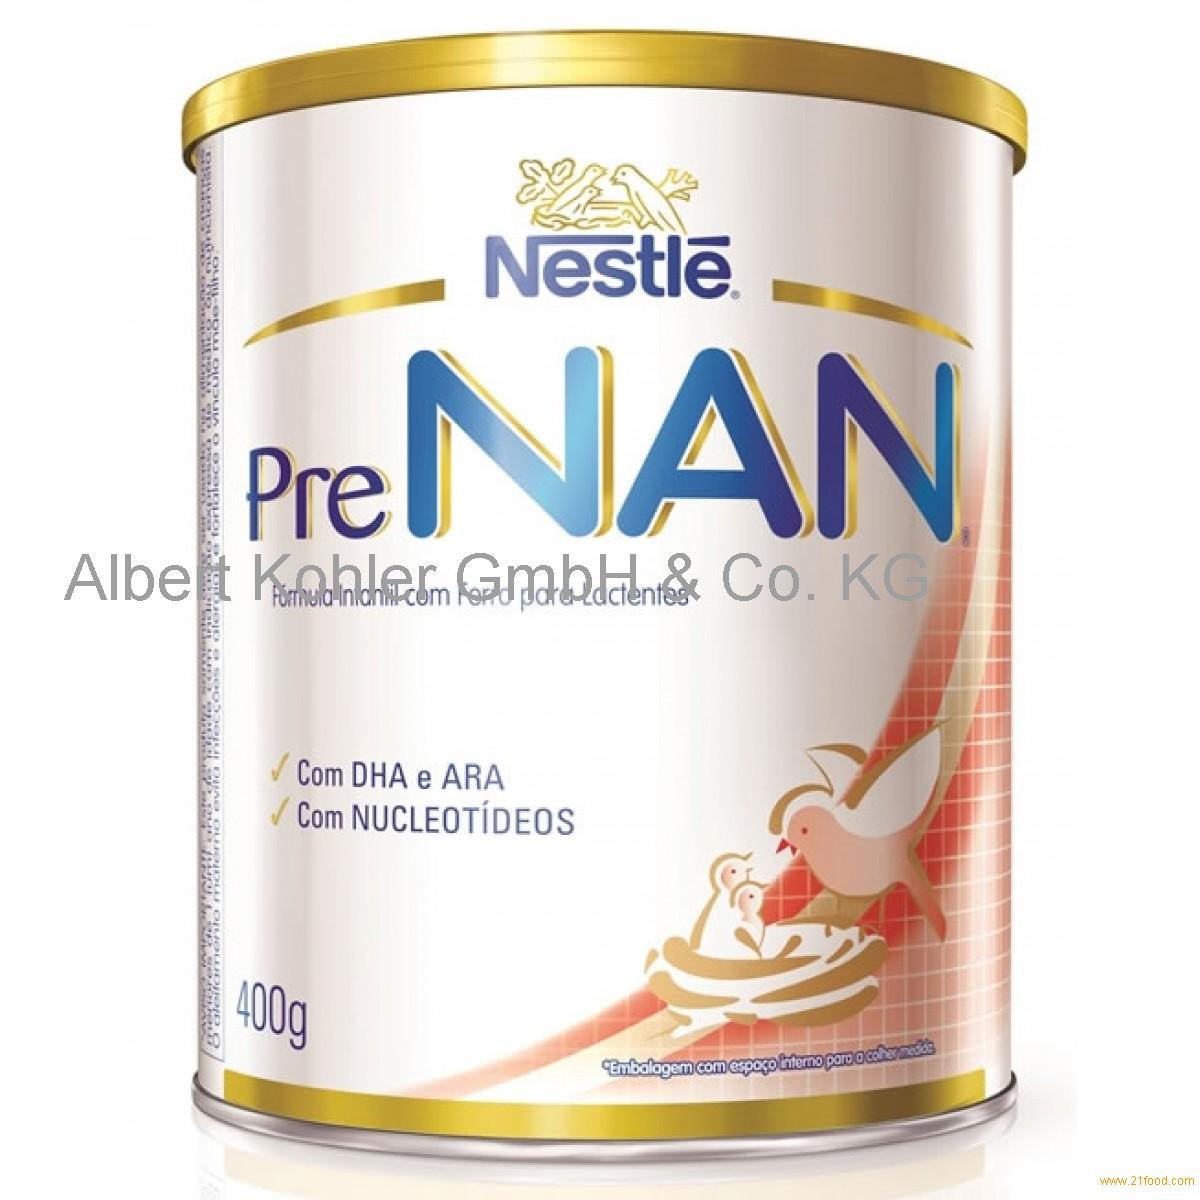 All Stage Nestle PRE NAN 400g